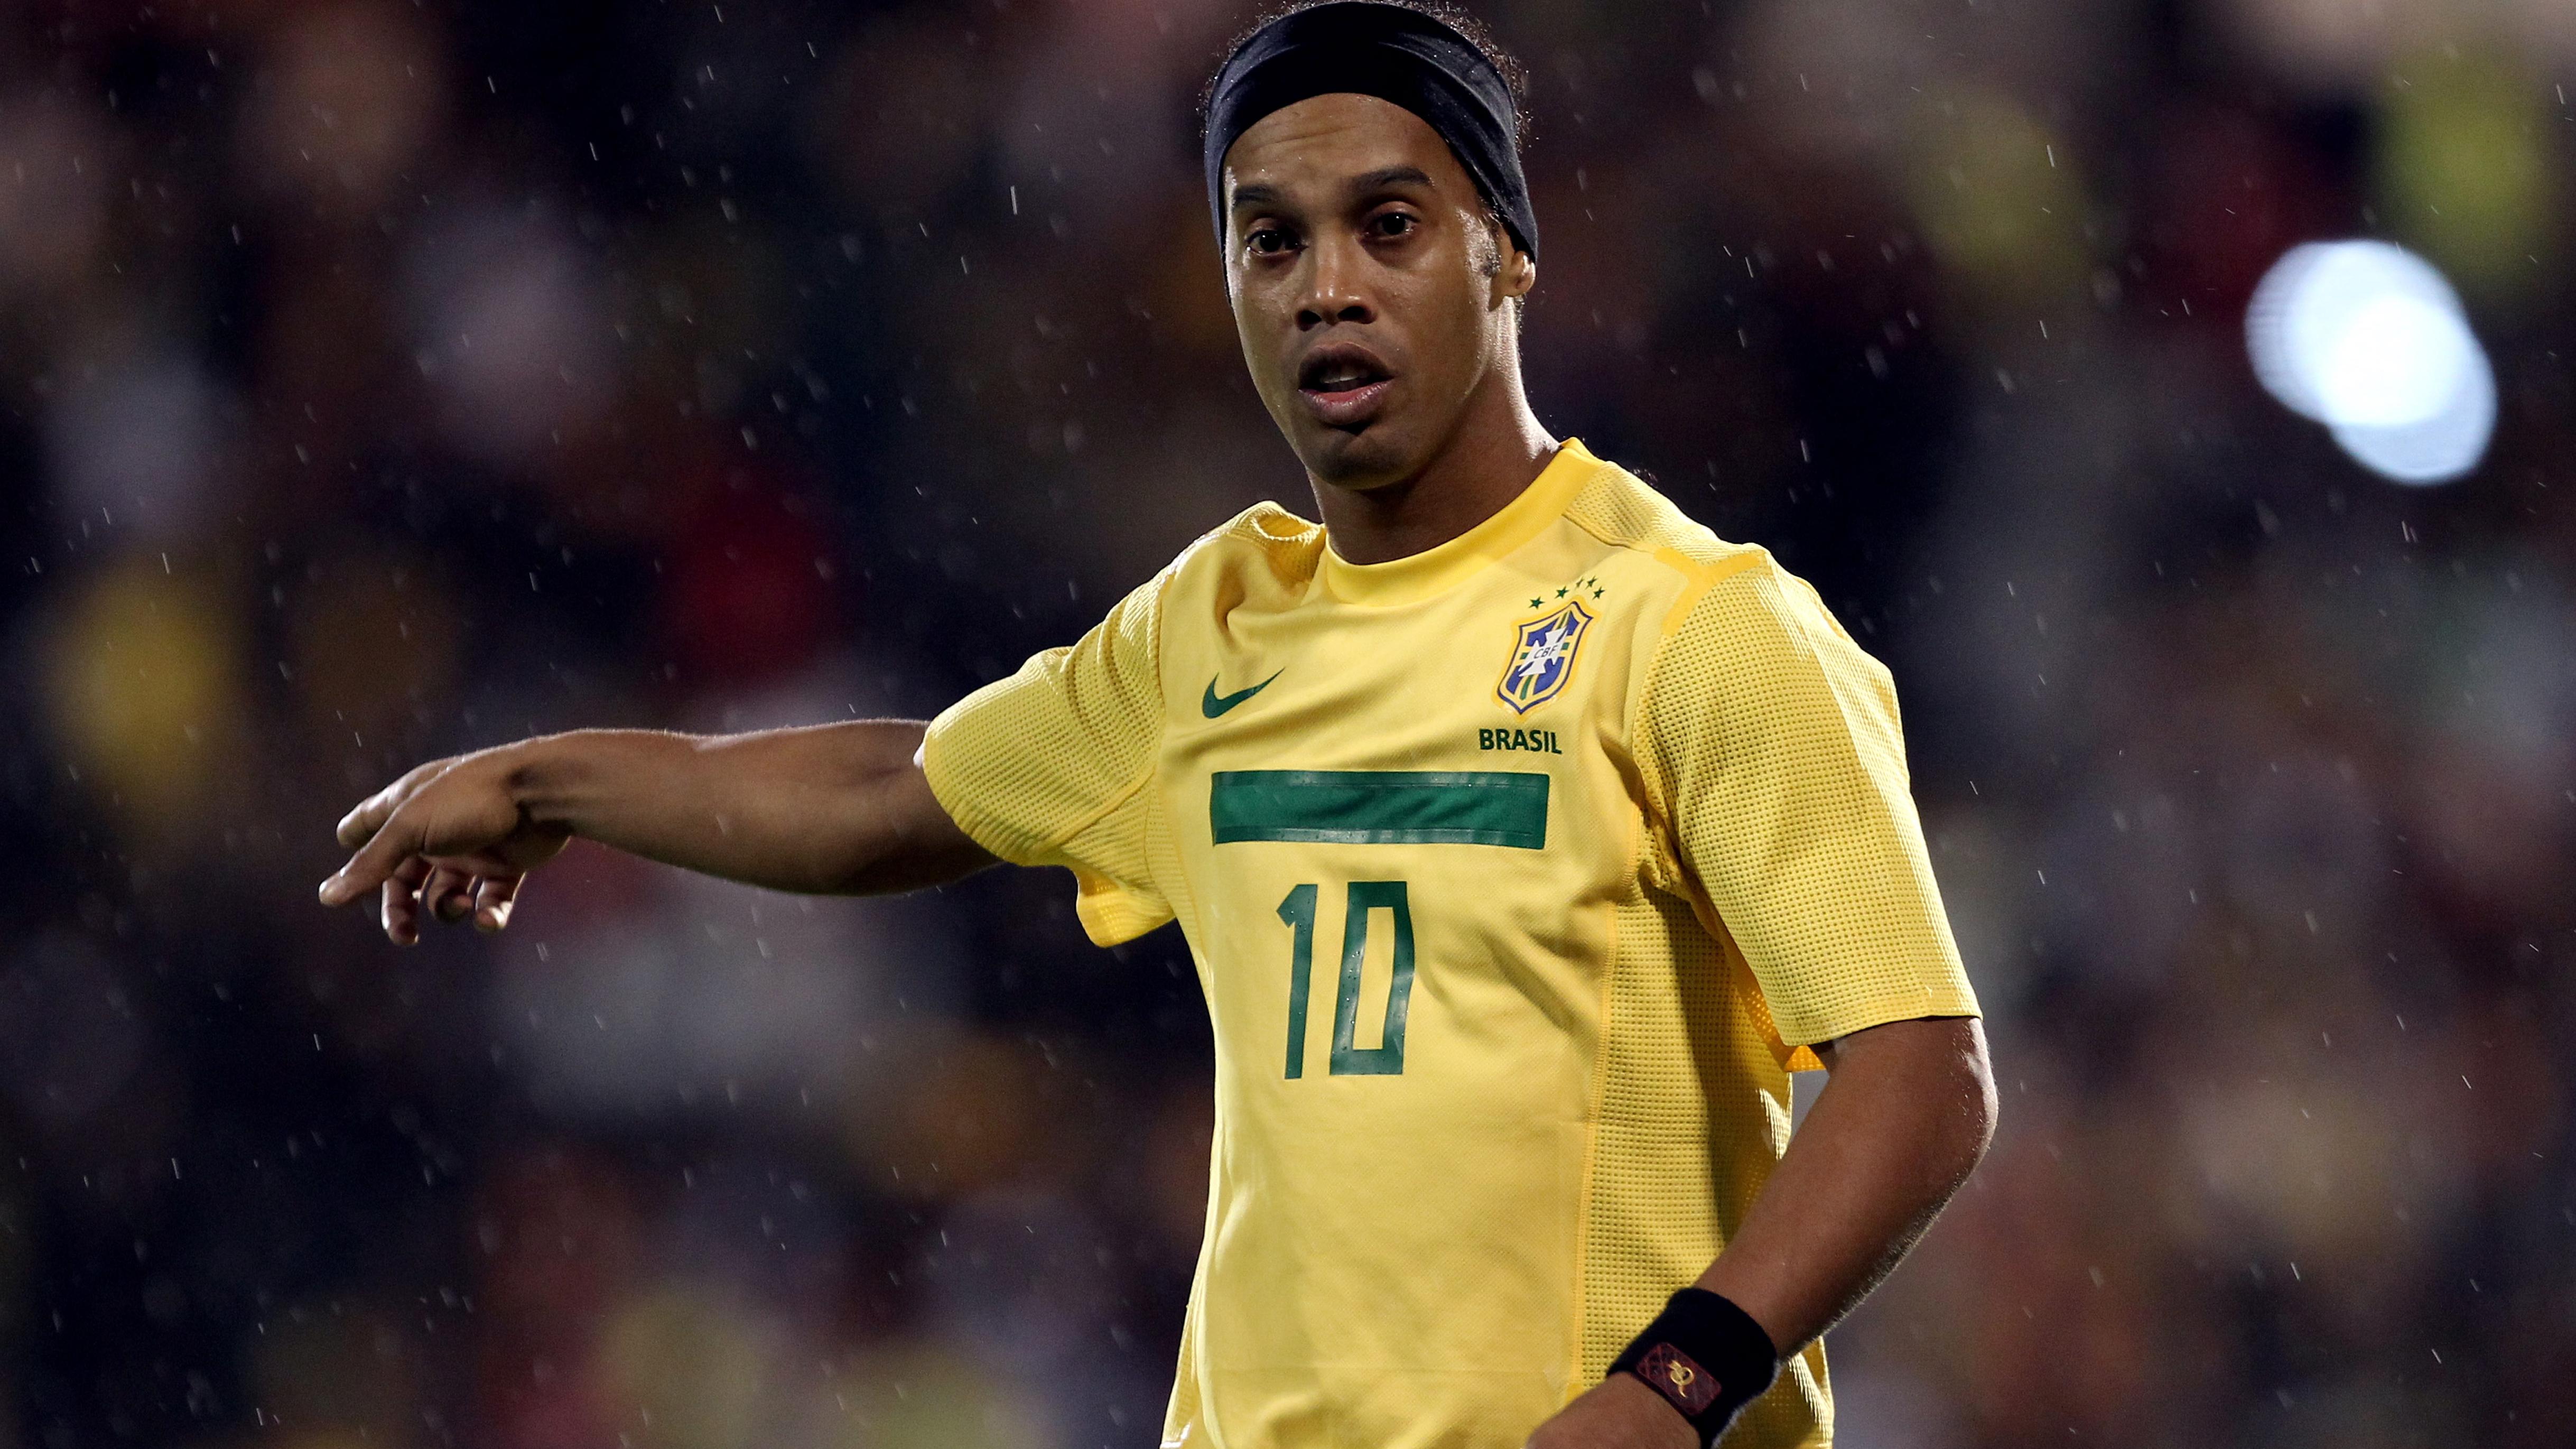 The Player Of Atletico Mineiro Ronaldinho In Brazils T Shirt